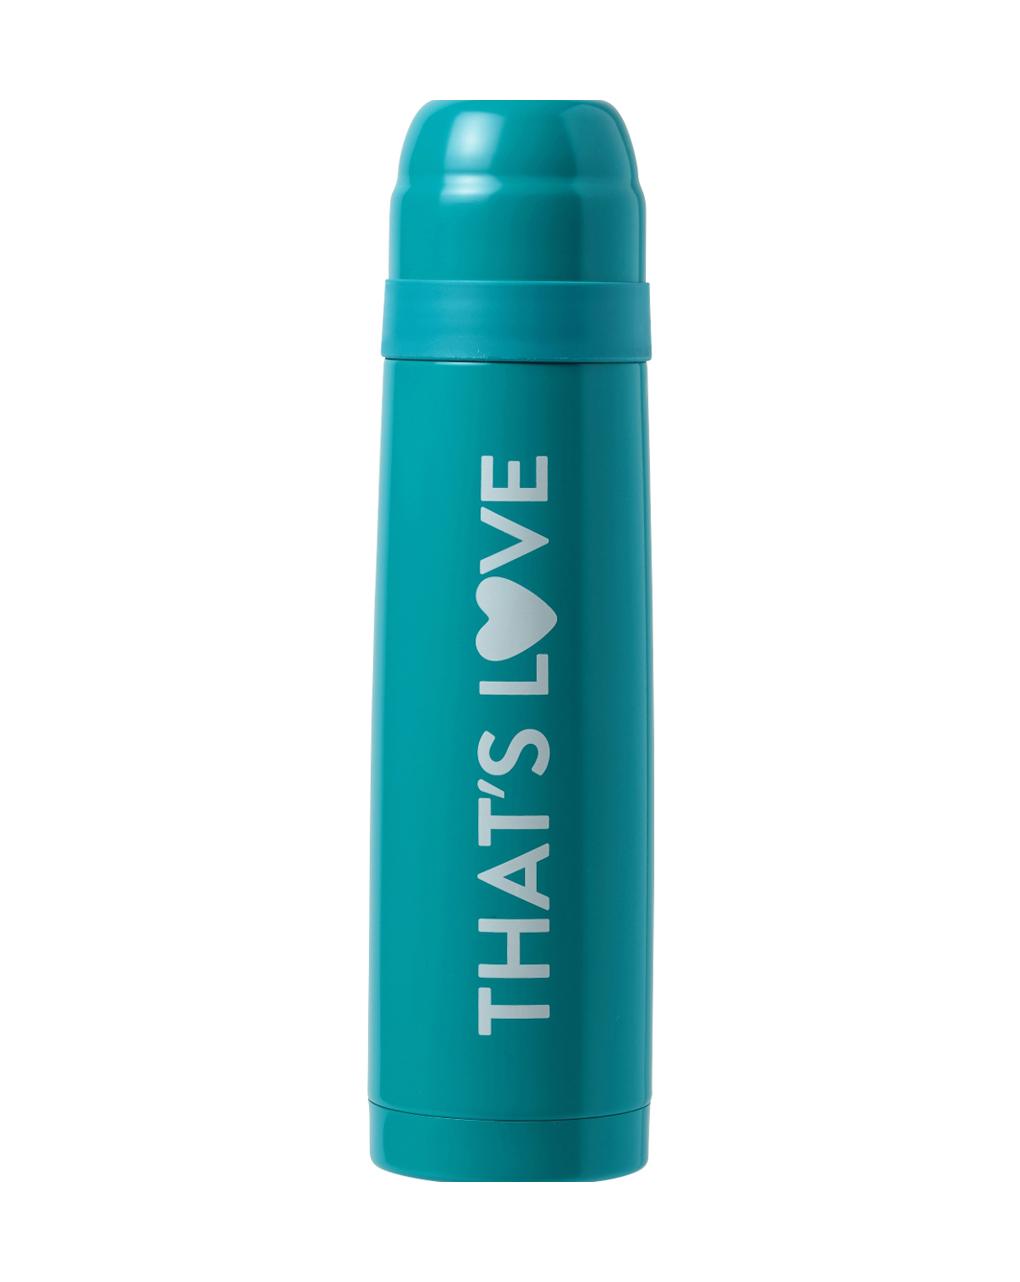 Frascos líquidos 500ml - That's Love